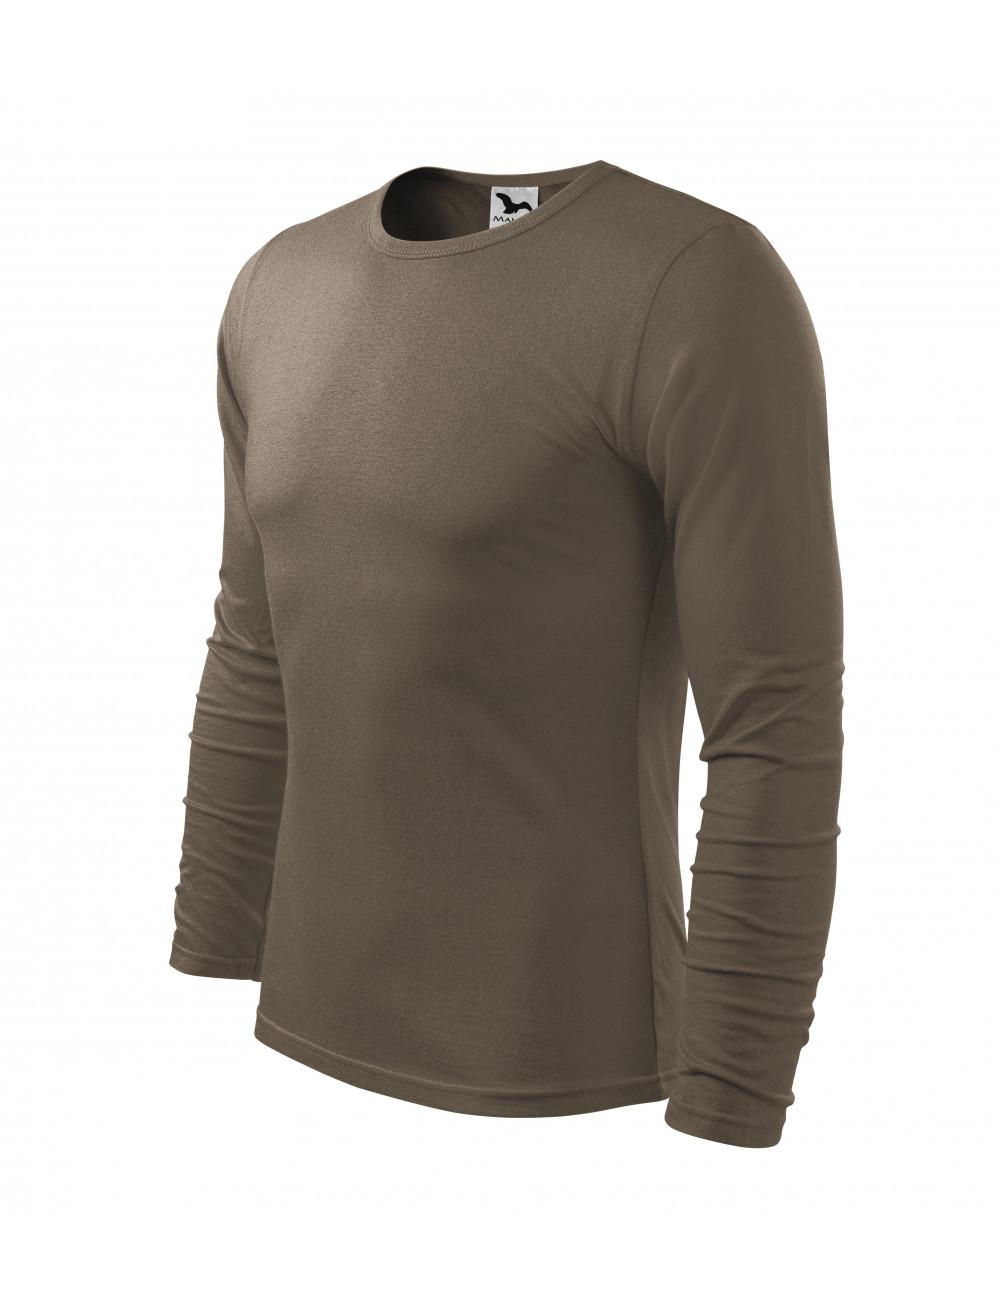 Adler MALFINI Koszulka męska Fit-T Long Sleeve 119 army